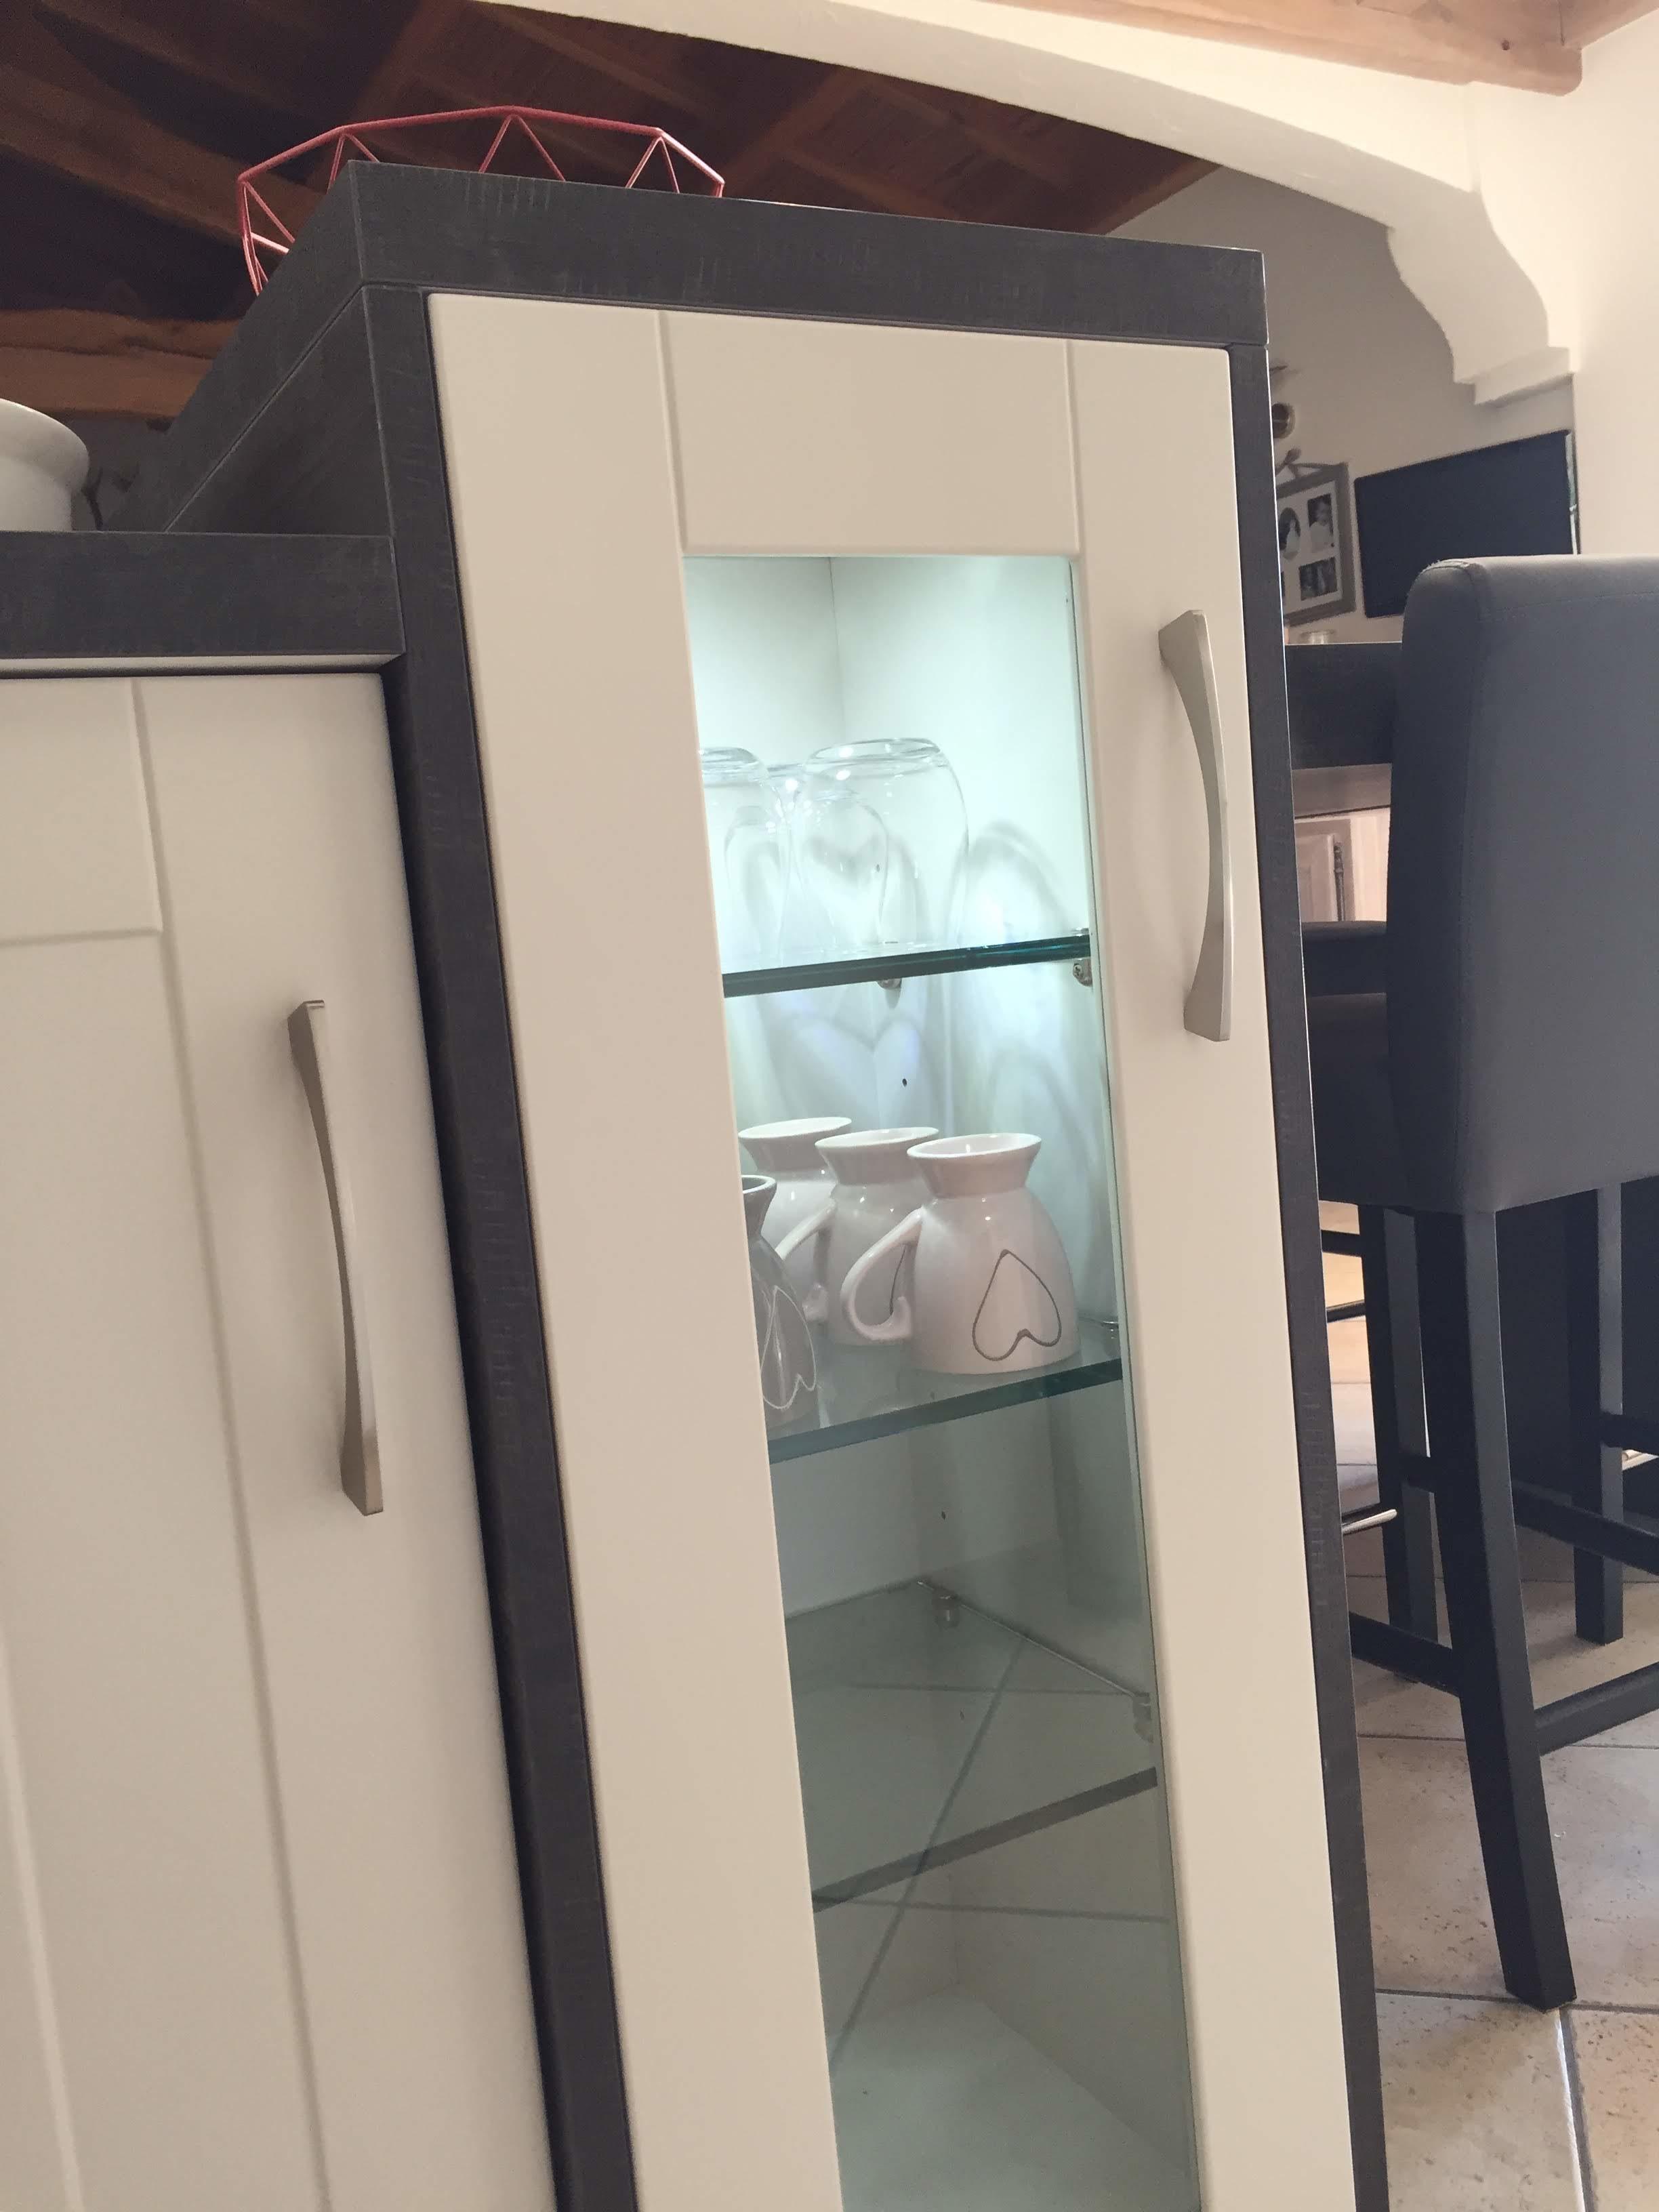 vitrine-eclairante-sur-ilot-cuisine